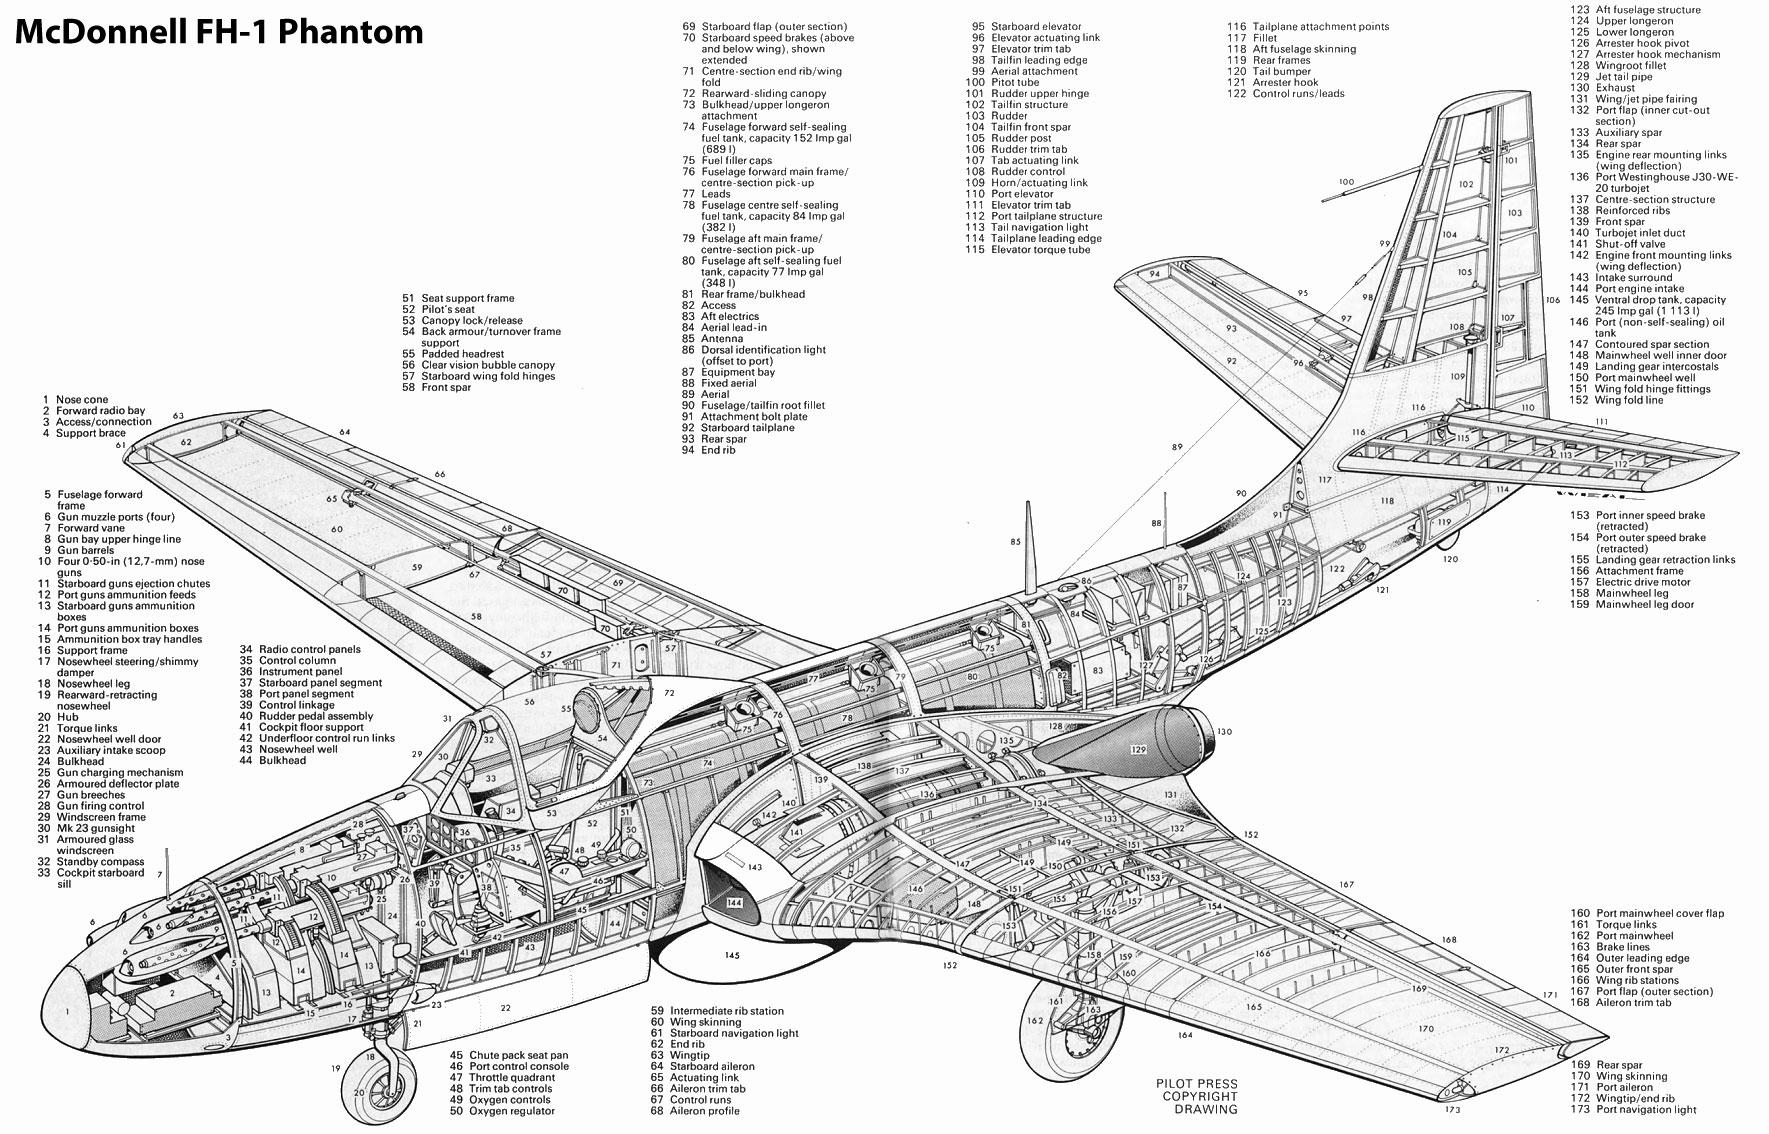 hs-129 b-2 pdf